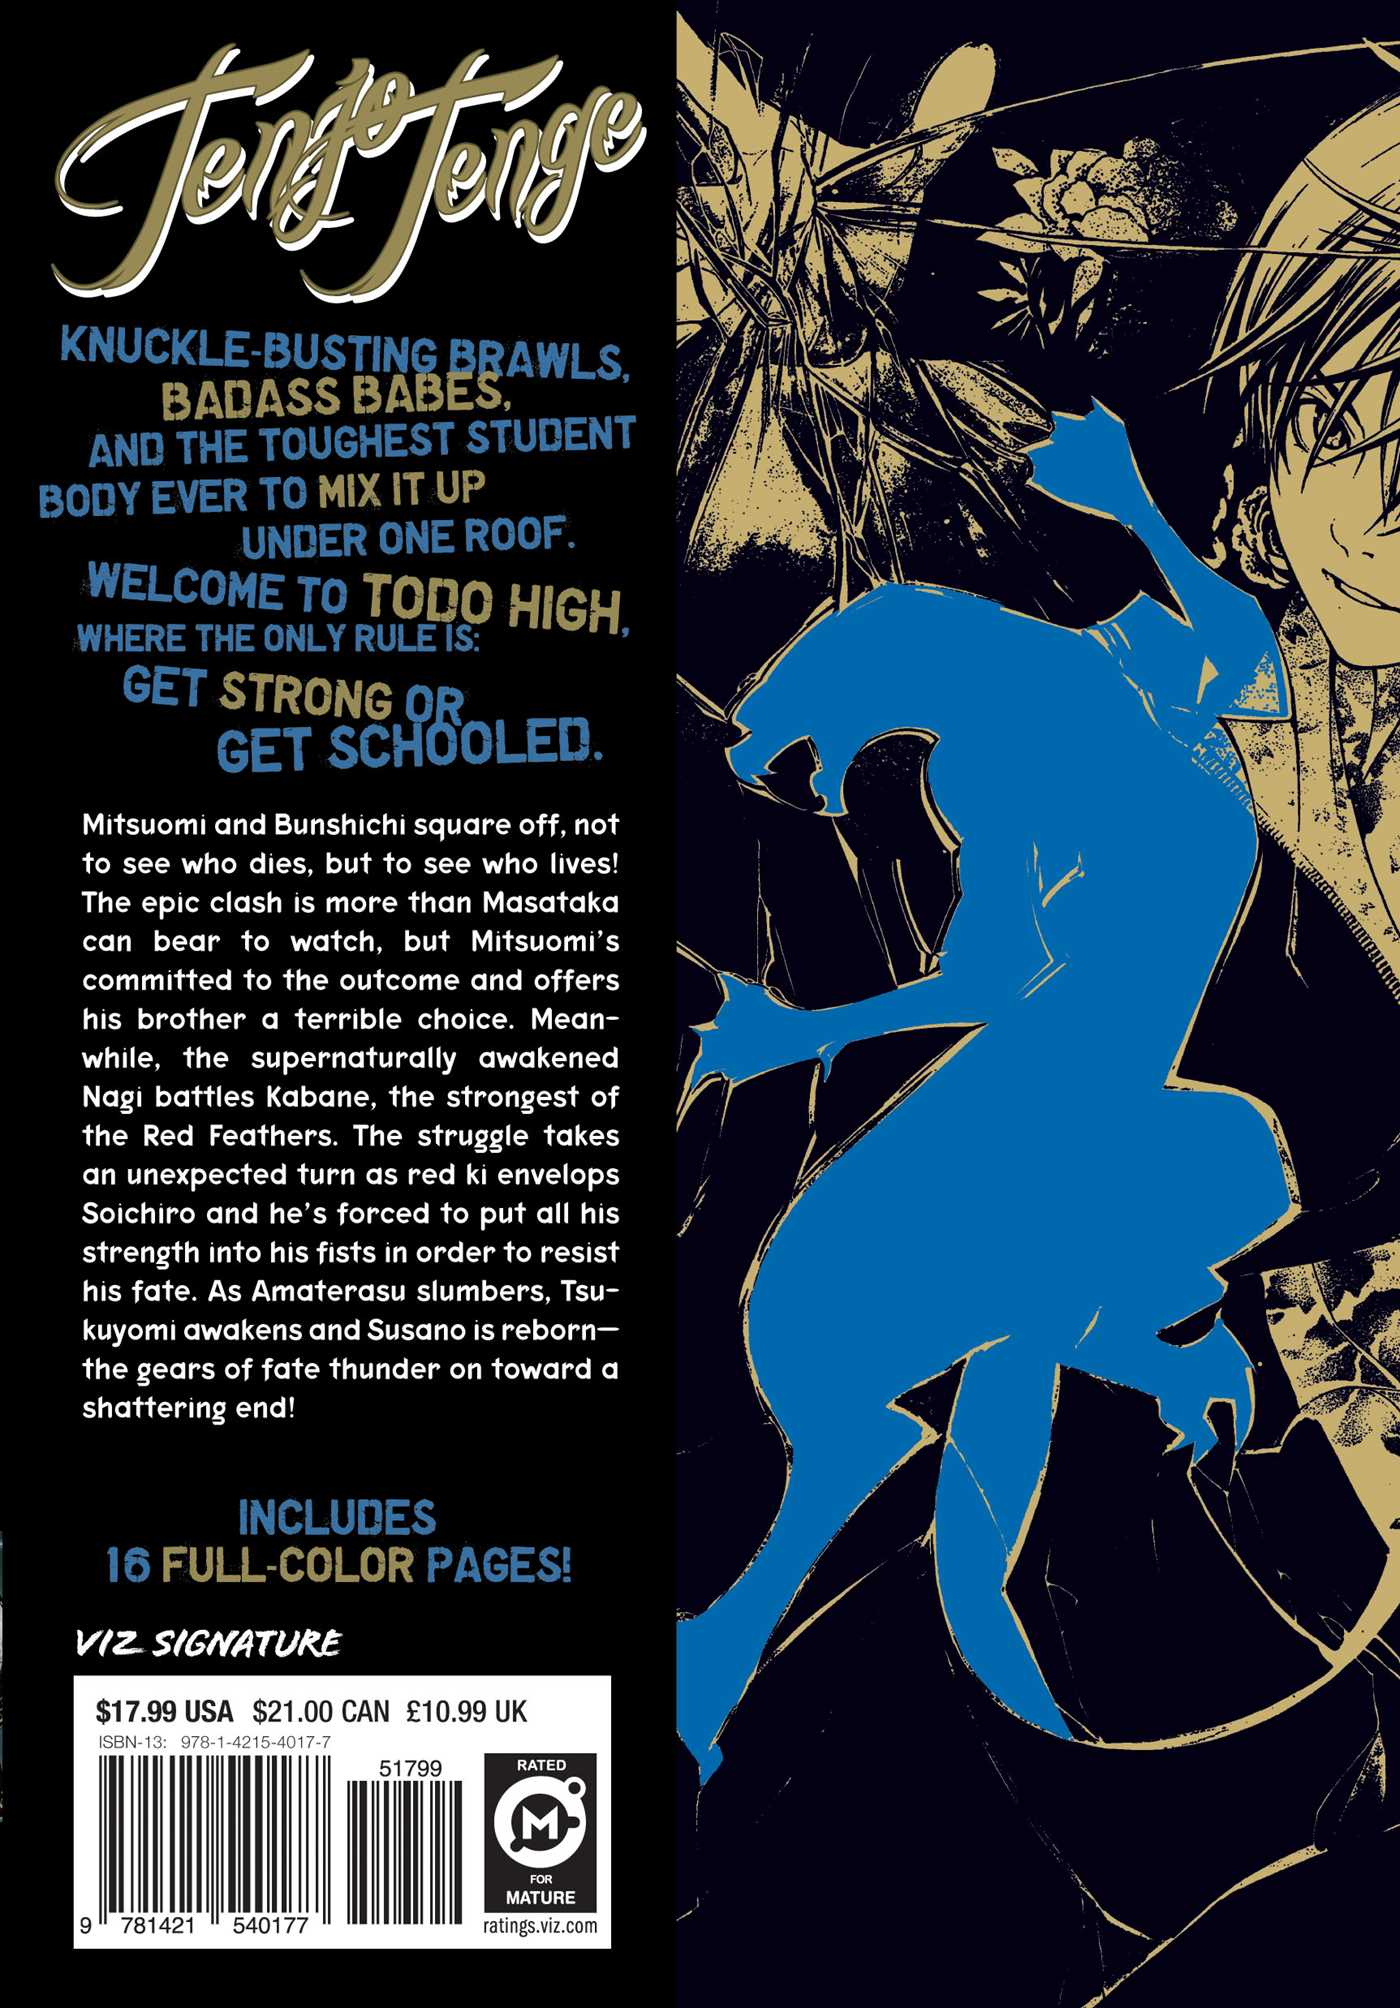 Tenjo tenge vol 10 9781421540177 hr back